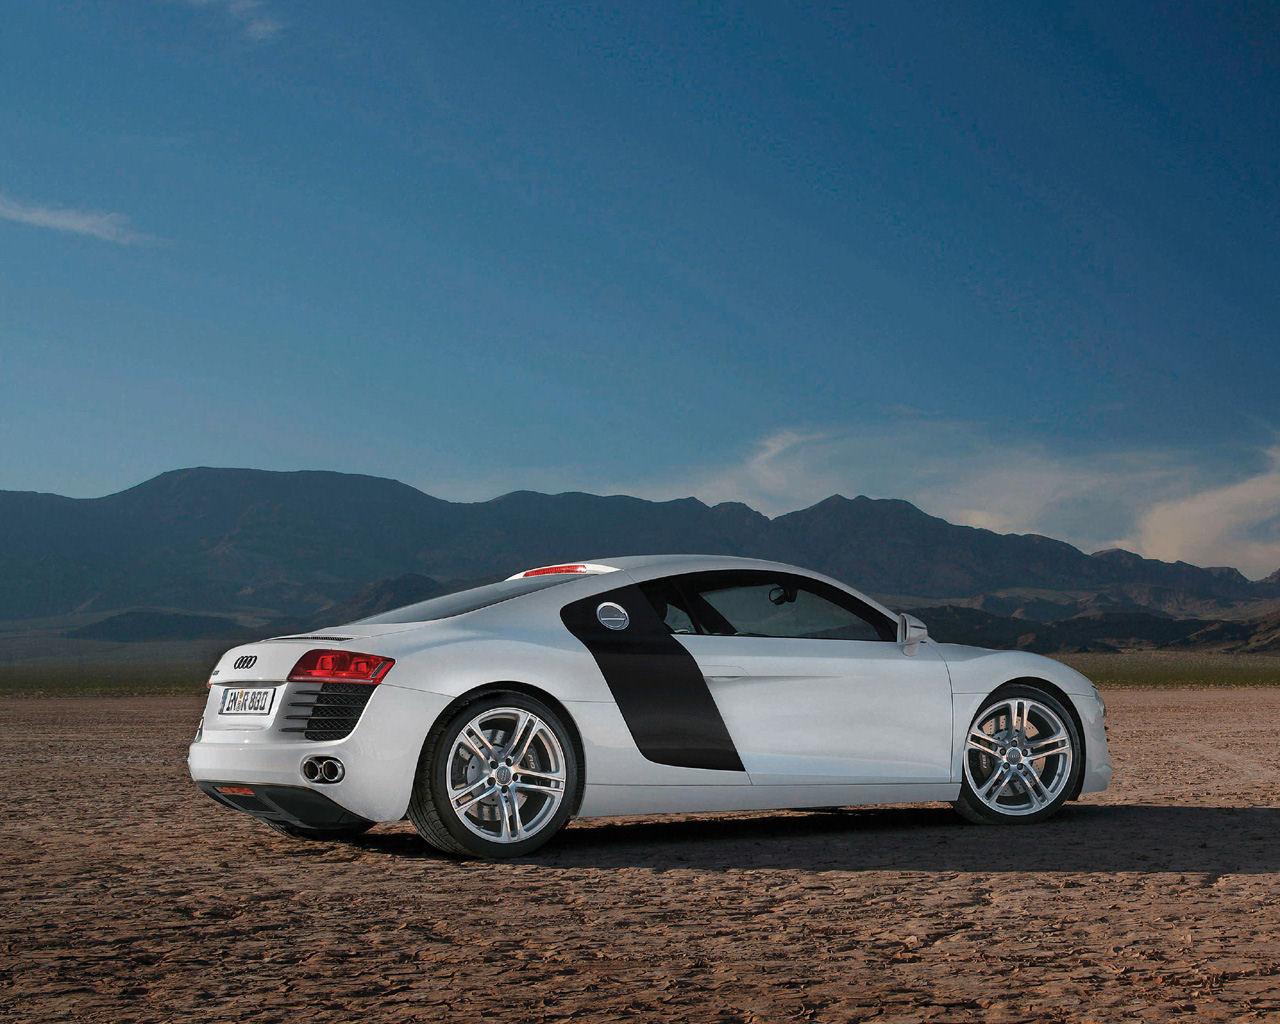 Audi R8 V8 V10 Quattro R Tronic   1280x1024 Wallpaper Desktop 1280x1024